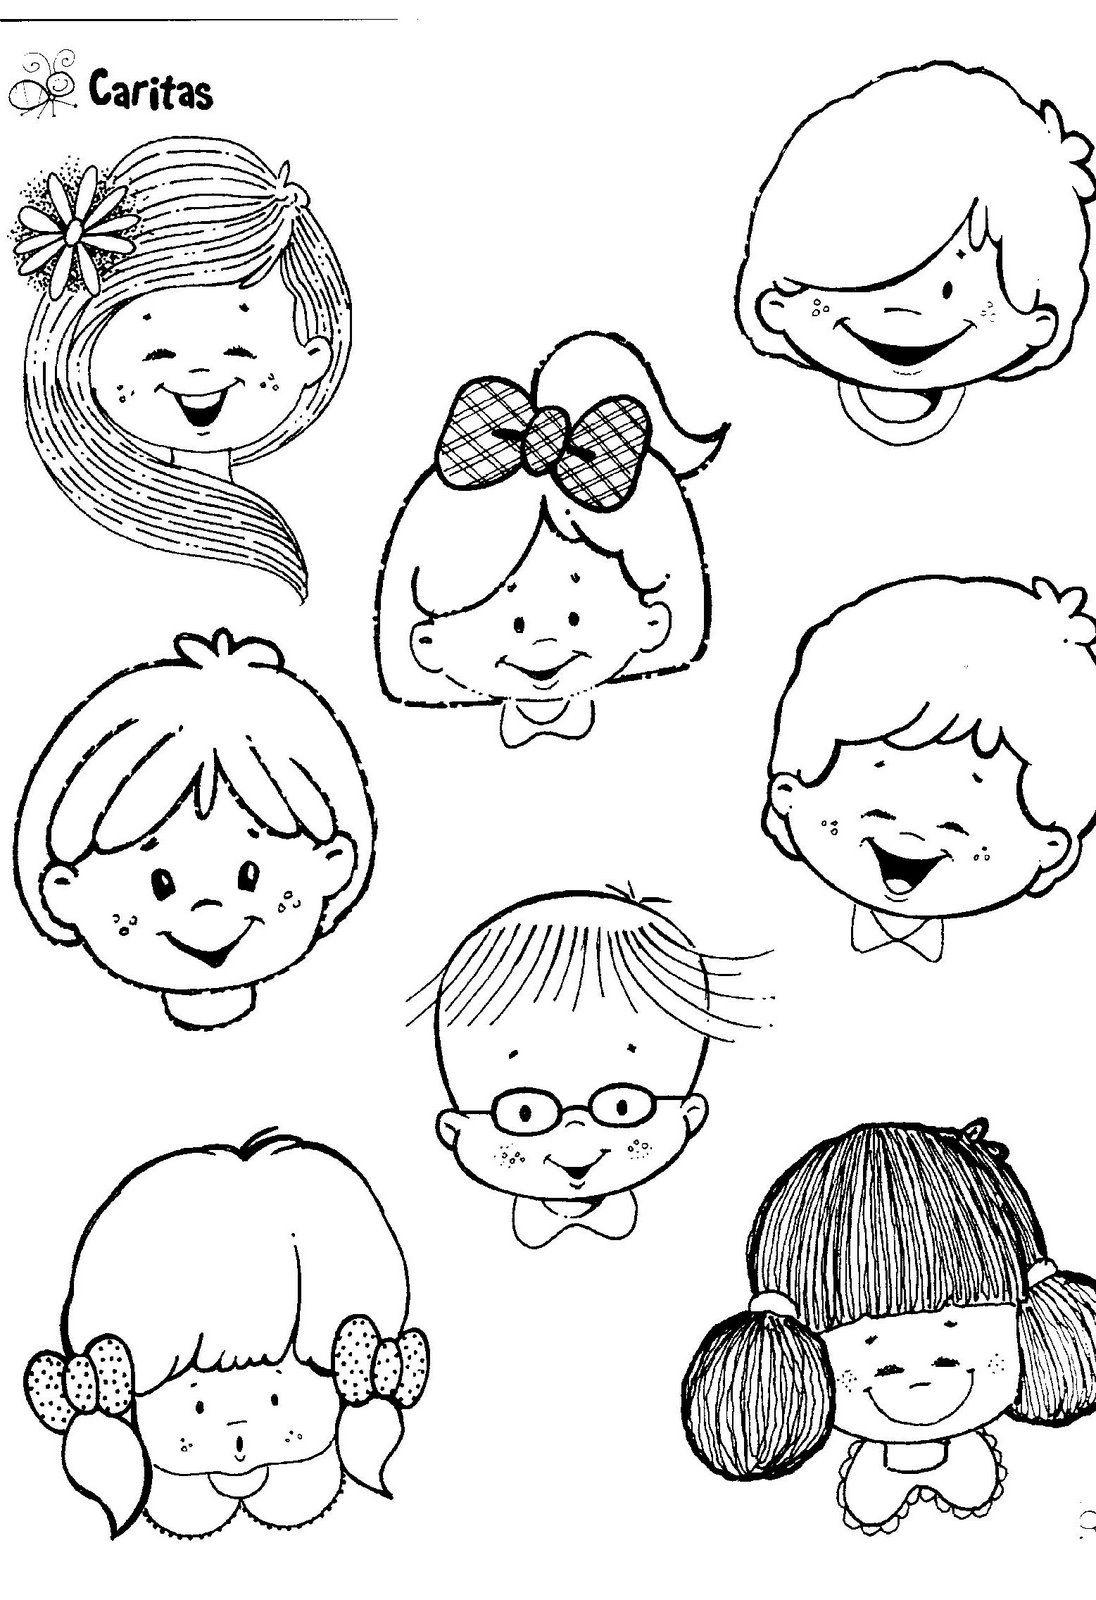 Dibujo De Caras Alegres Para Descargar Caritas Para Colorear Caras De Ninos Dibujos De Caras